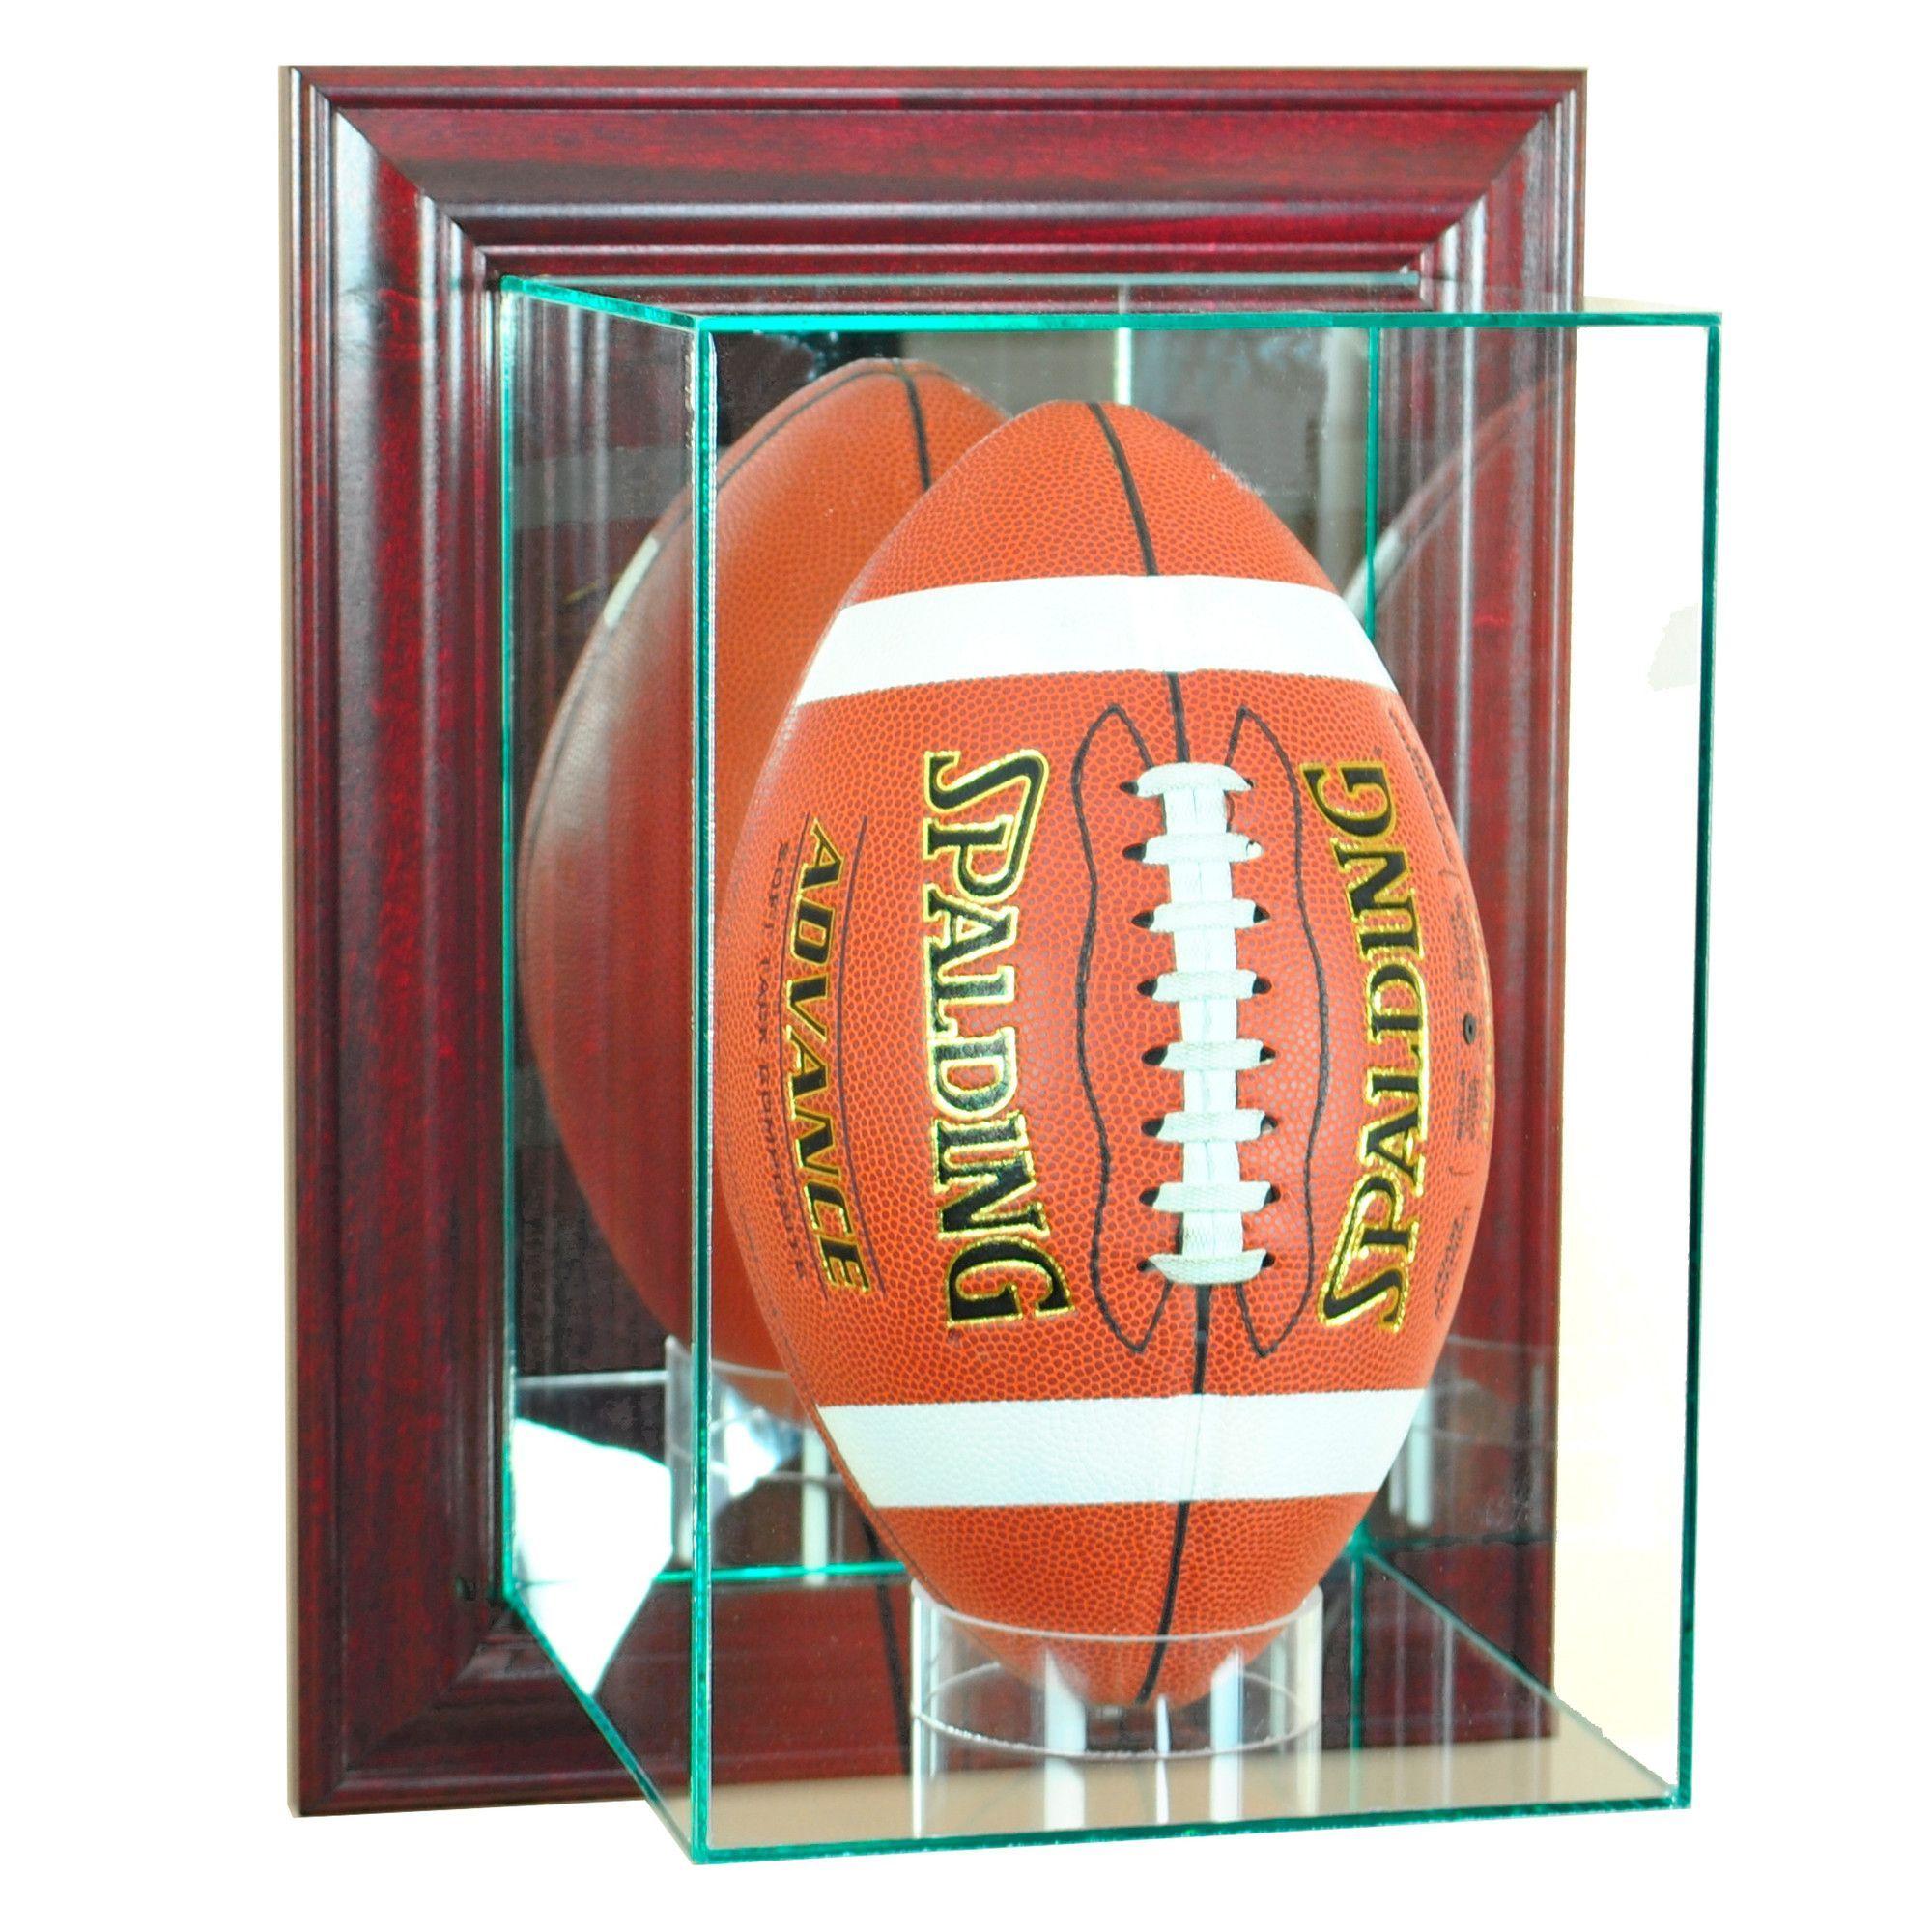 Wall Mounted Upright Football Football Display Cases Glass Display Case Display Case